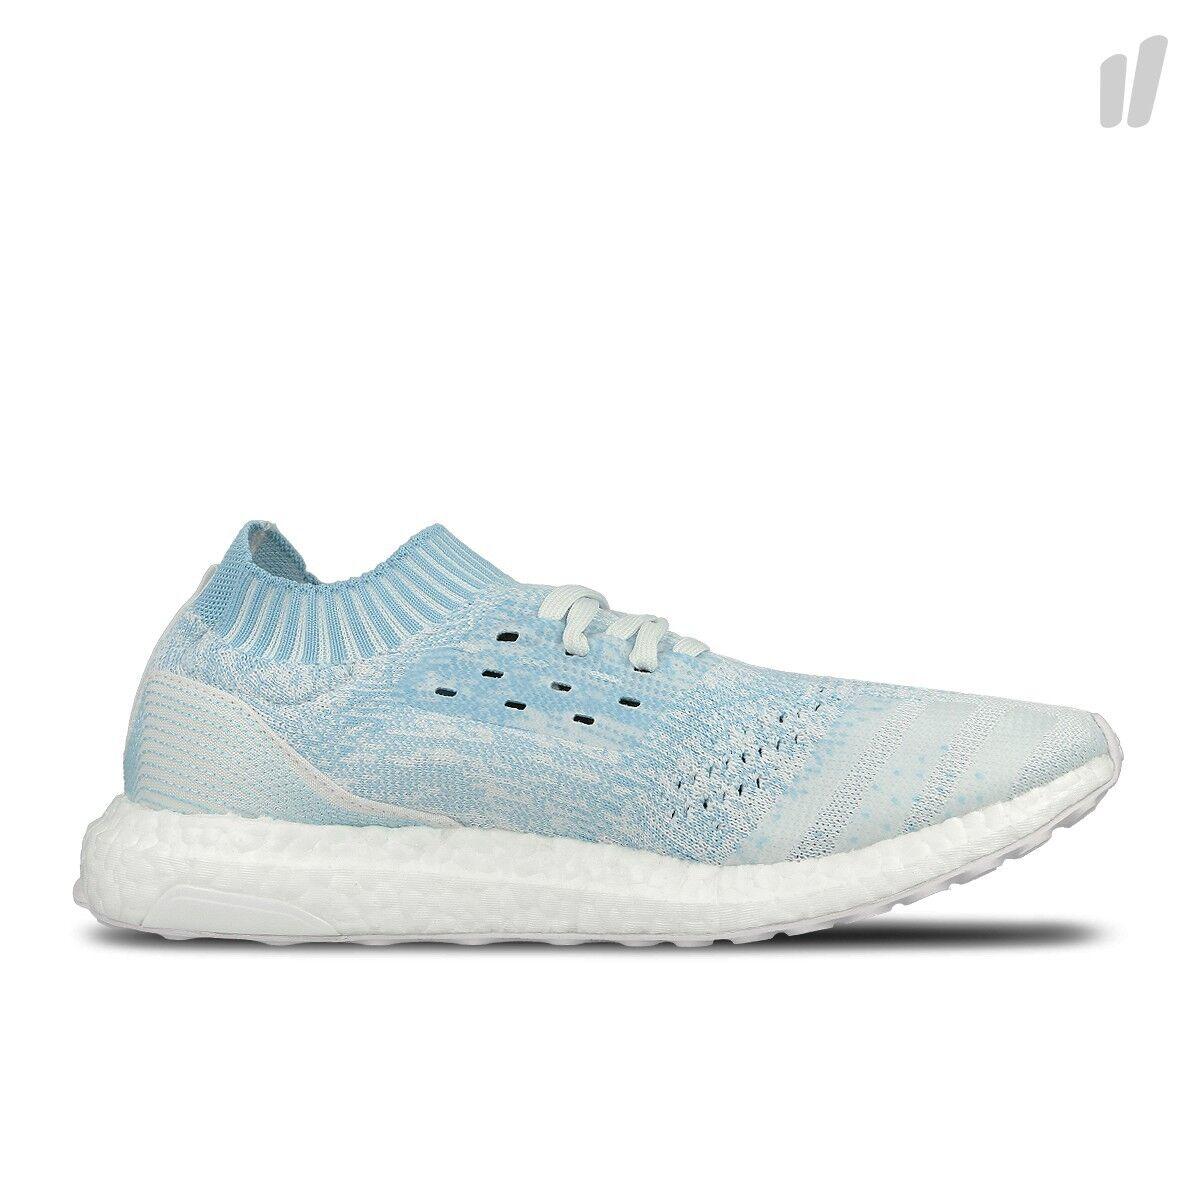 NEW Adidas Parley Ocean Ultra Boost Uncaged Weiß   ICEY Blau CP9686  - Limited